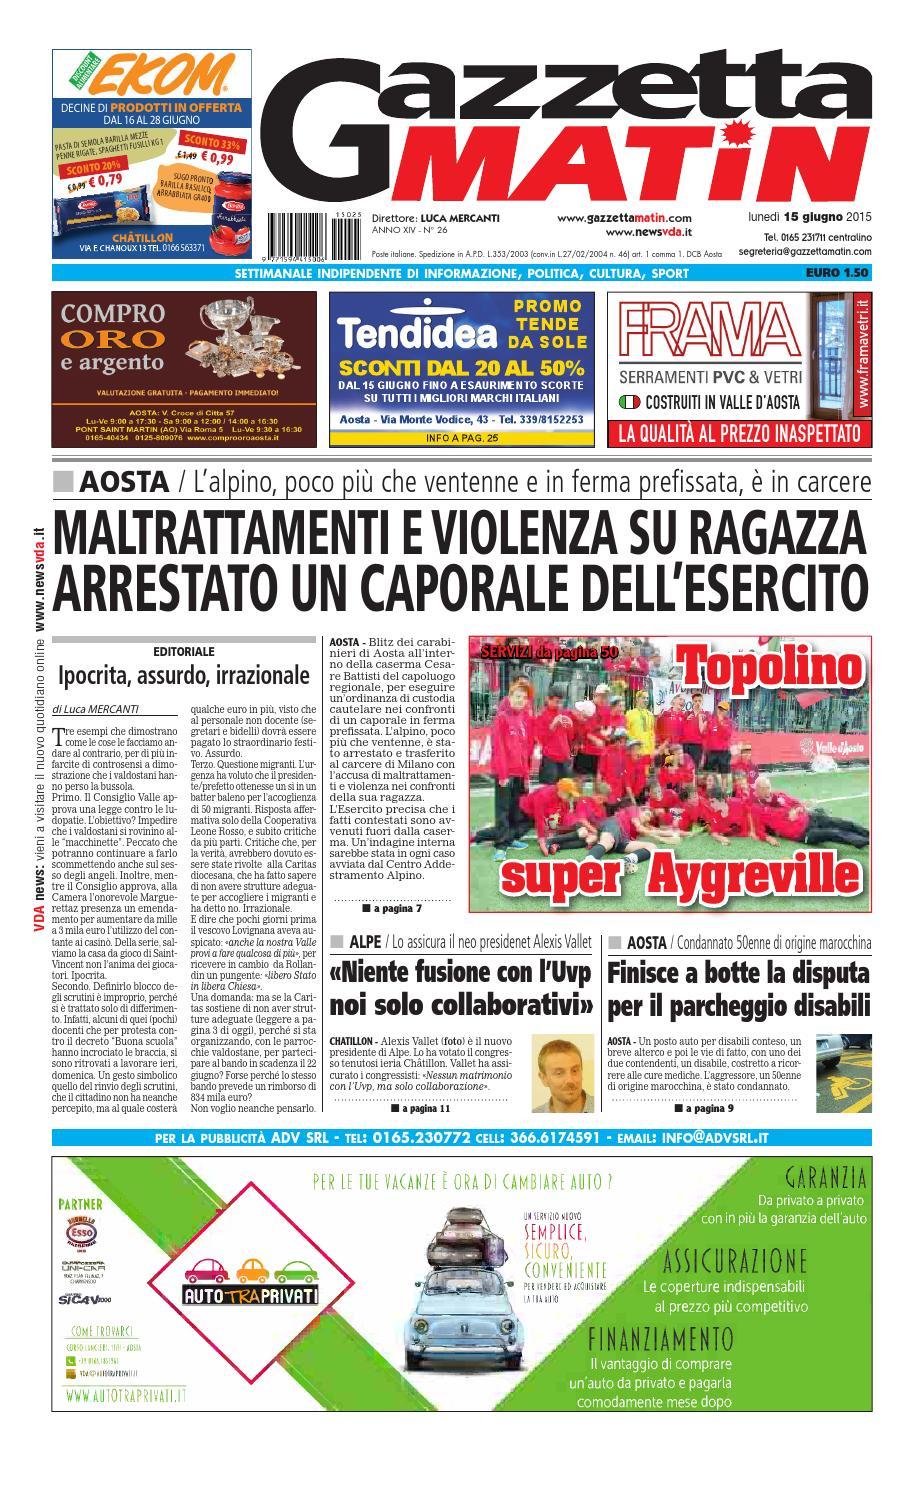 Gazzetta Matin del 15 giugno 2015 by NewsVDA - issuu f2e7920b2b0